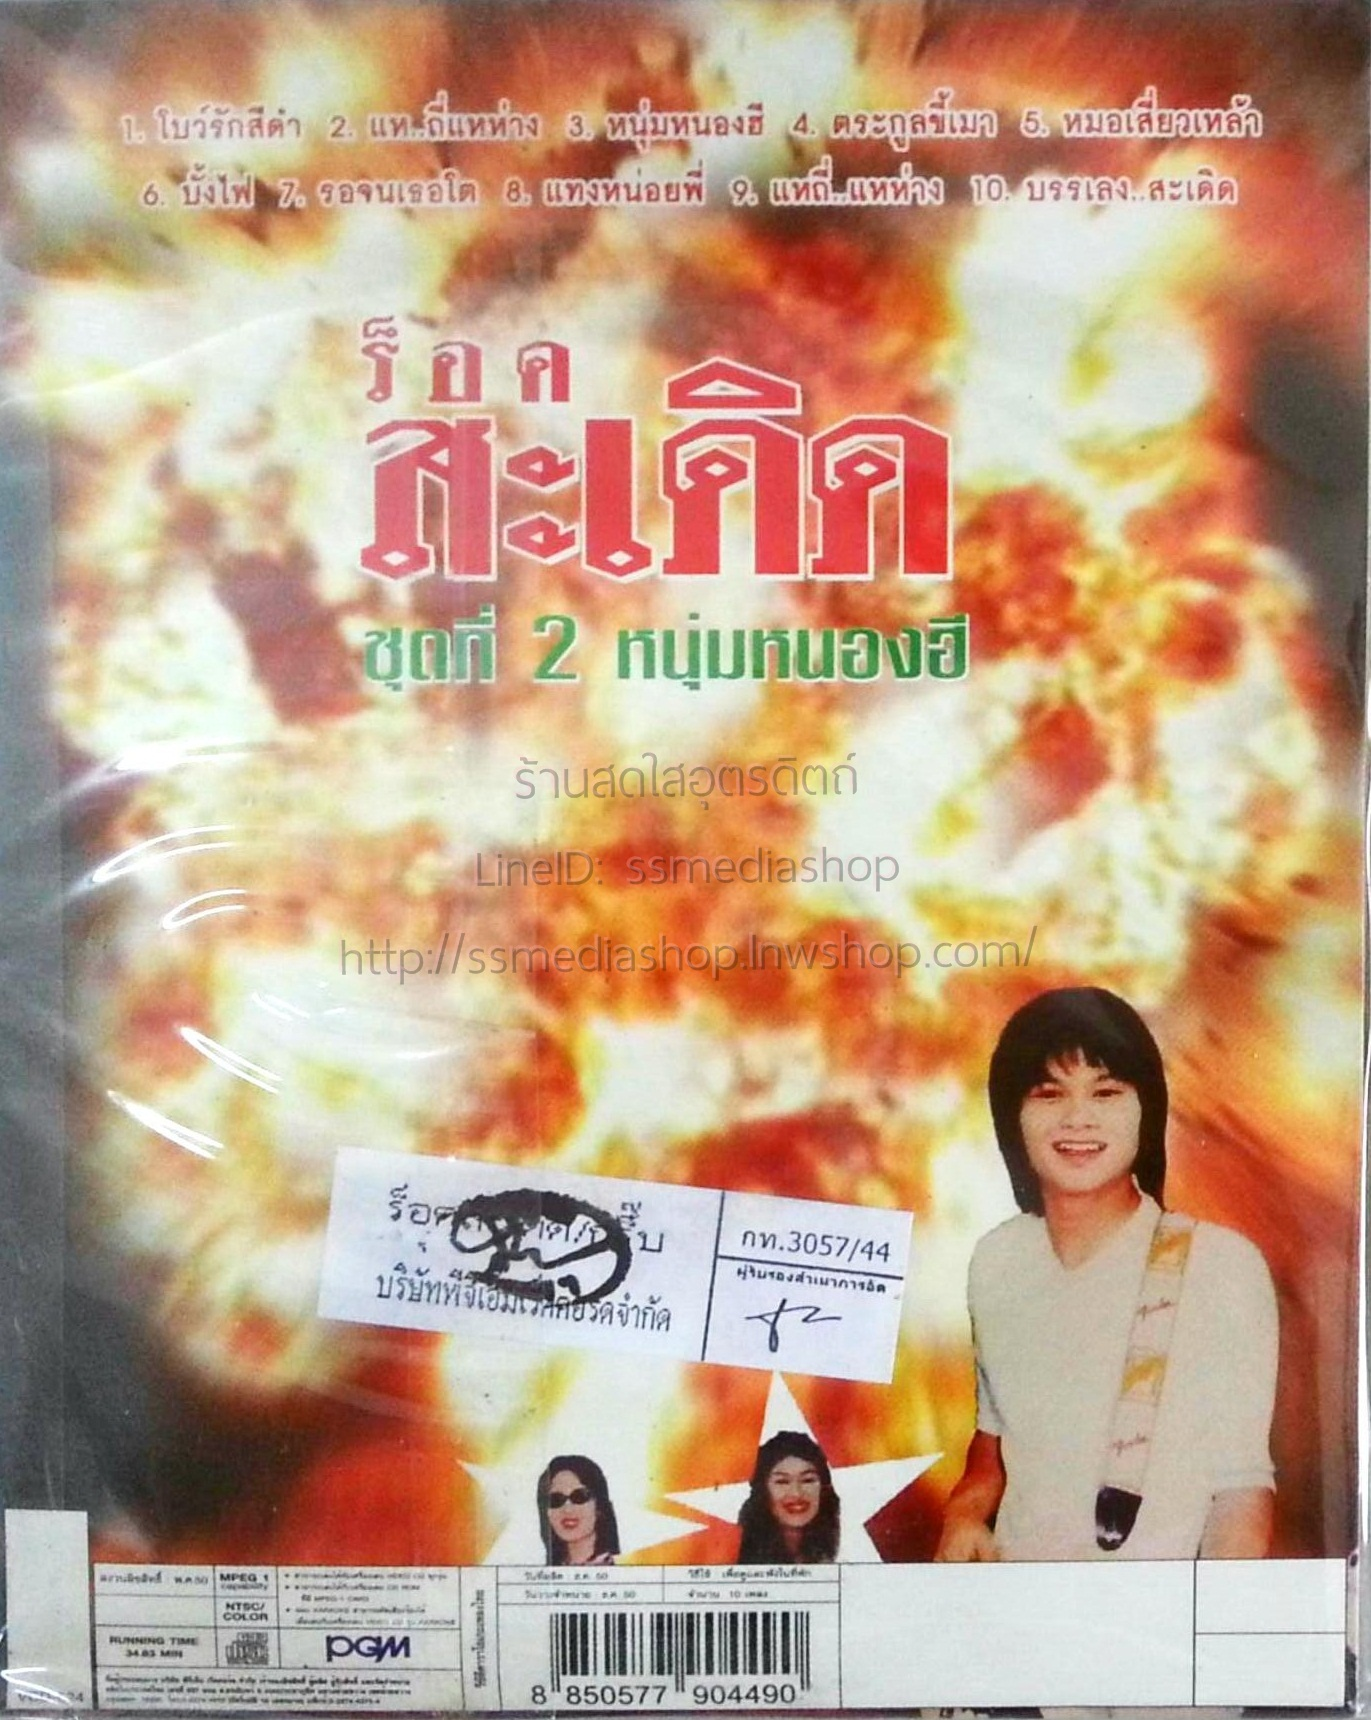 VCD ร็อก สะเดิด ชุดที่2 หนุ่มหนองฮี